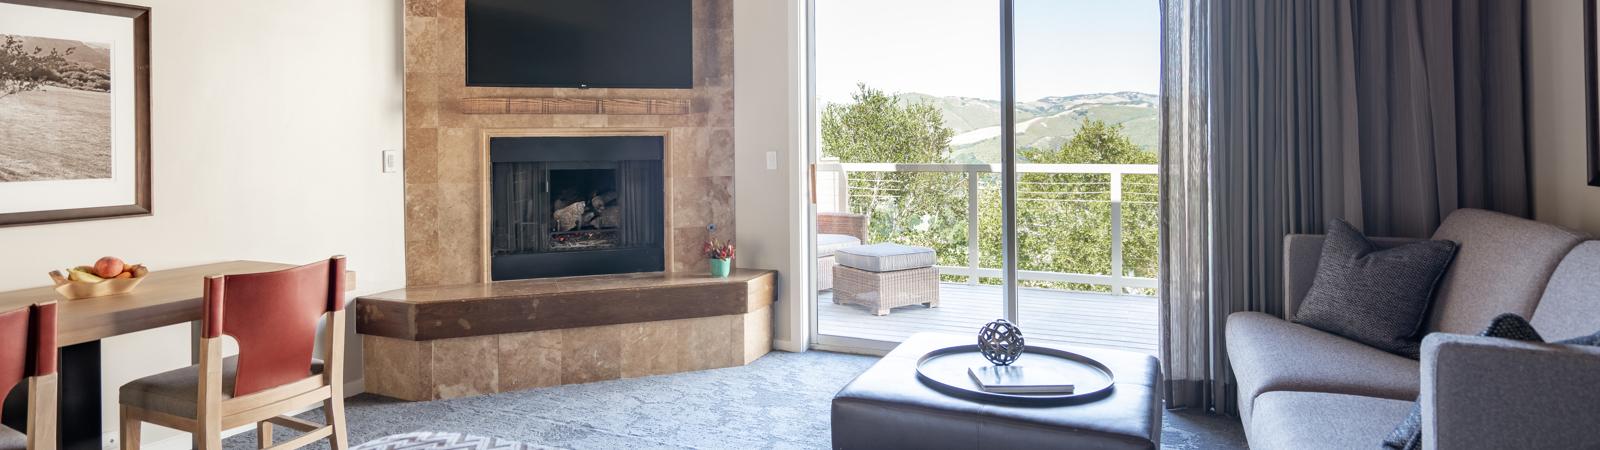 Carmel Valley Ranch_Accommodations_Santa Lucia Studio King_Bedroom_336_3_CR